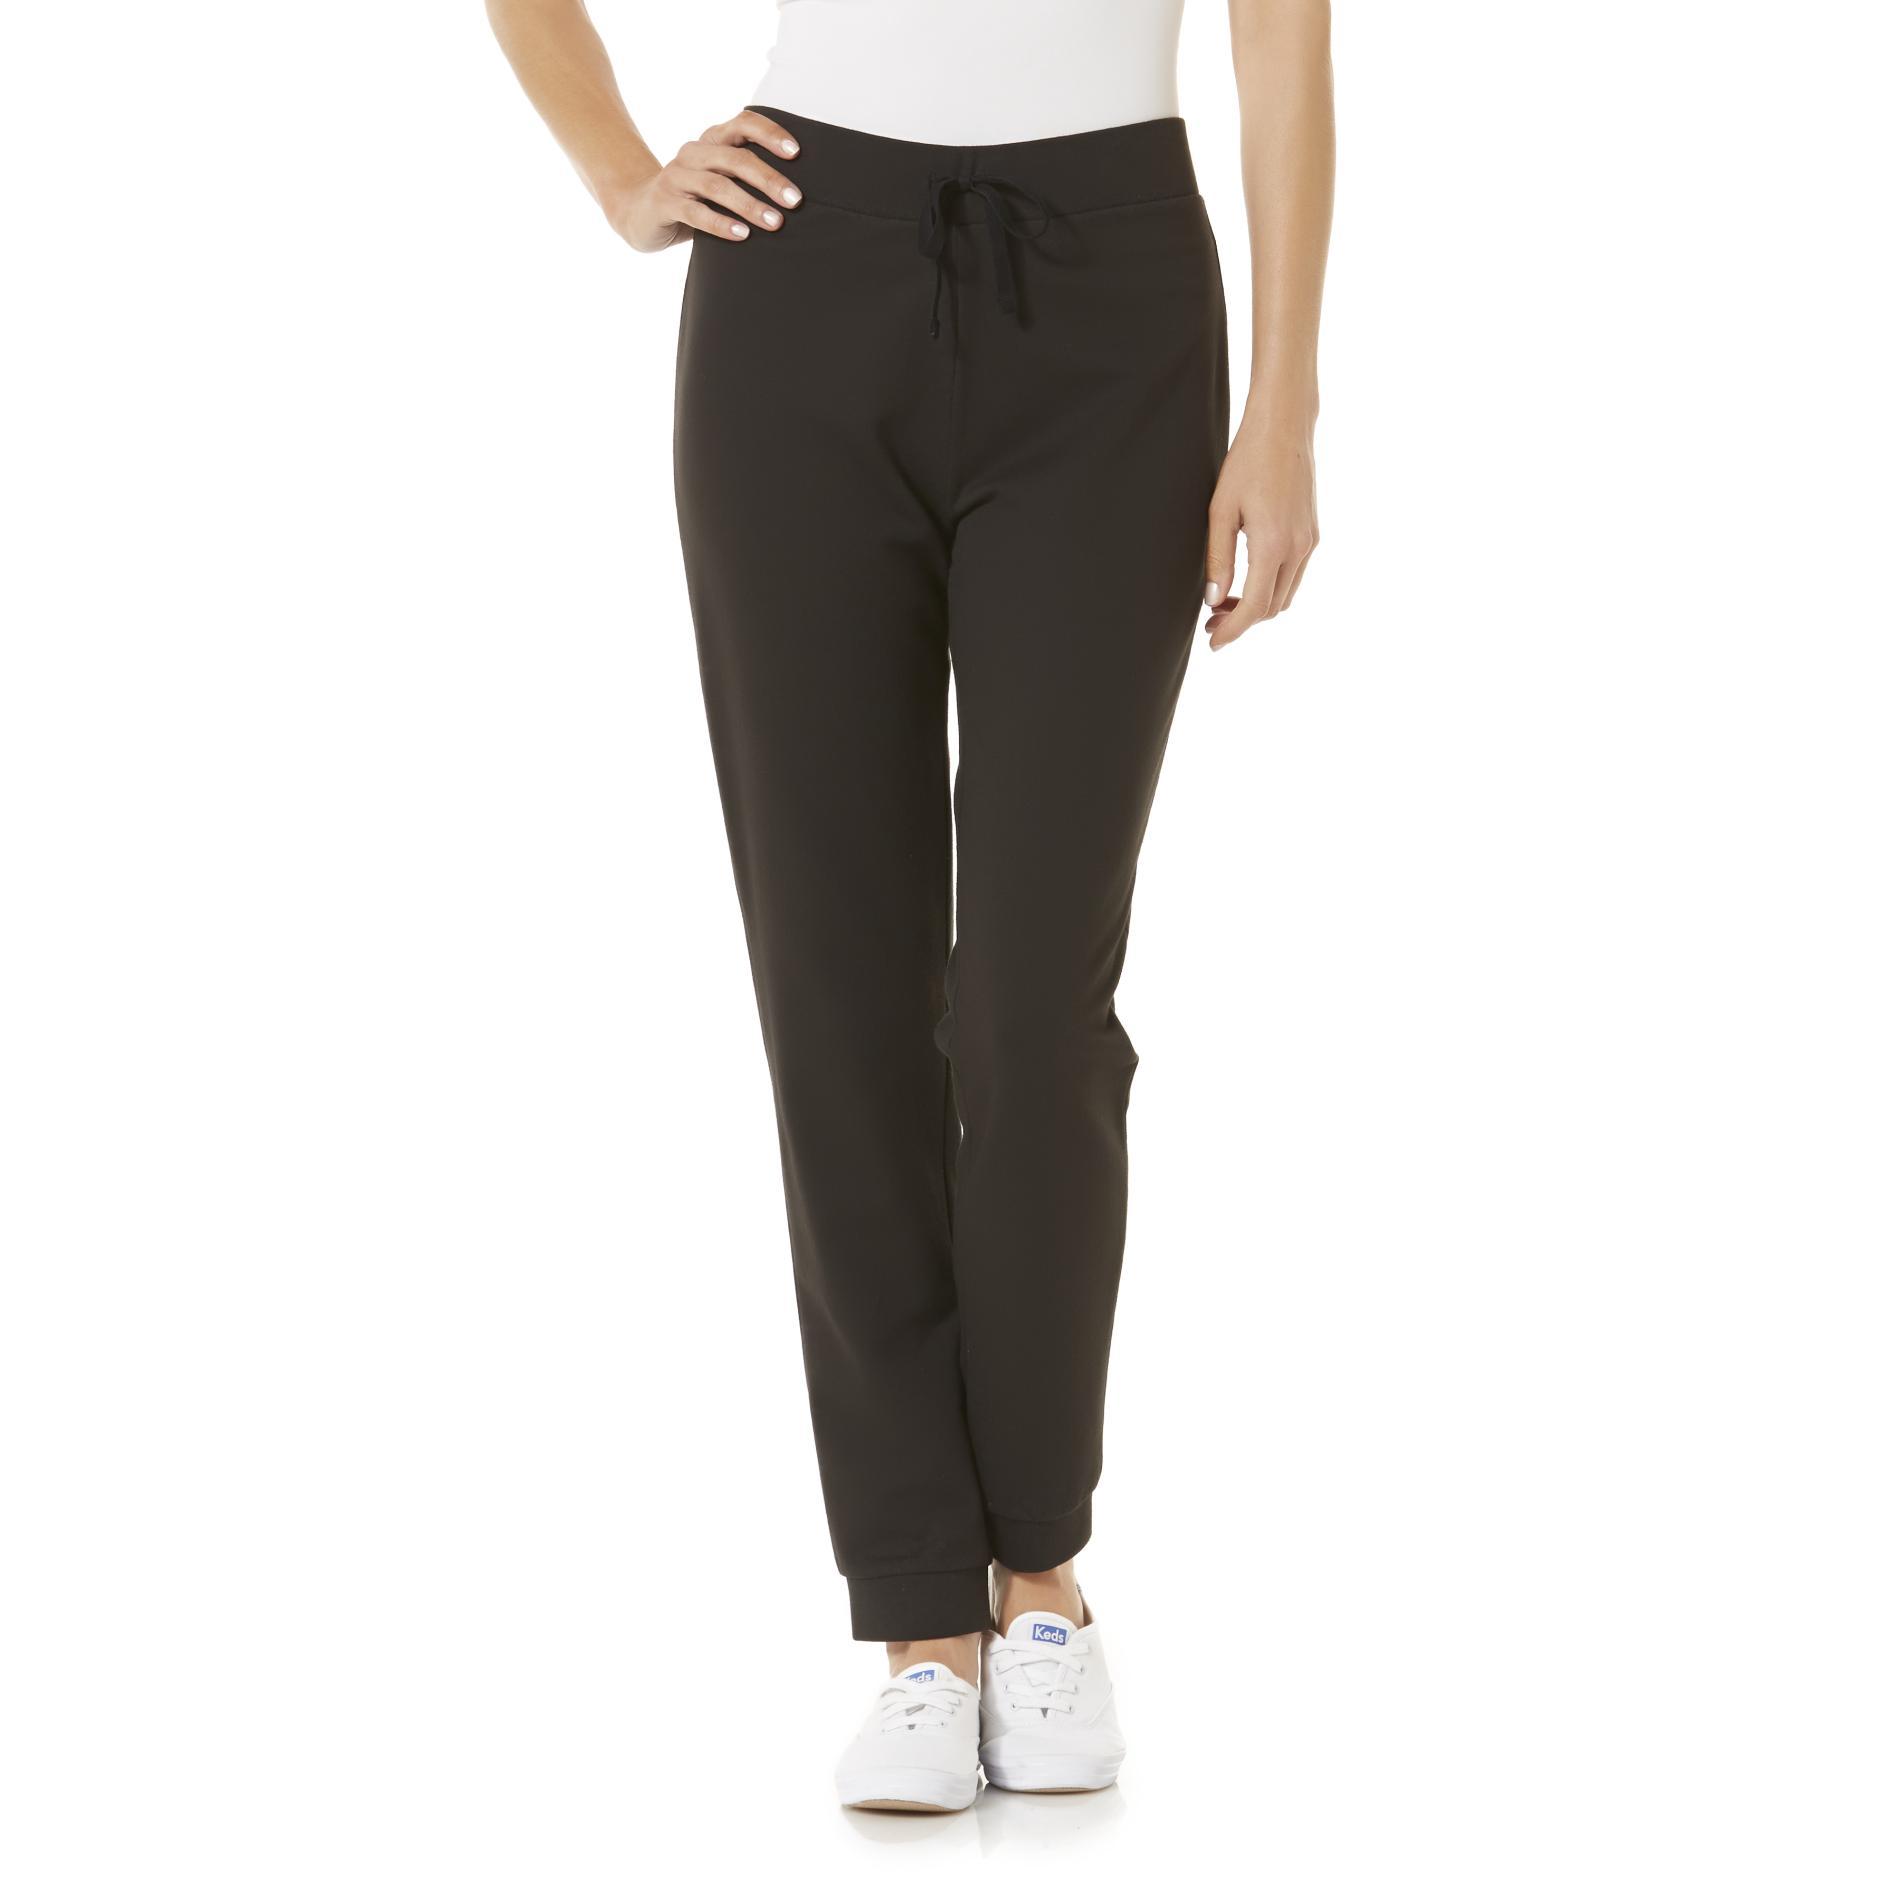 Jaclyn Smith Women's Embellished Lounge Pants PartNumber: 027VA84759912P MfgPartNumber: WH5JS53081MI